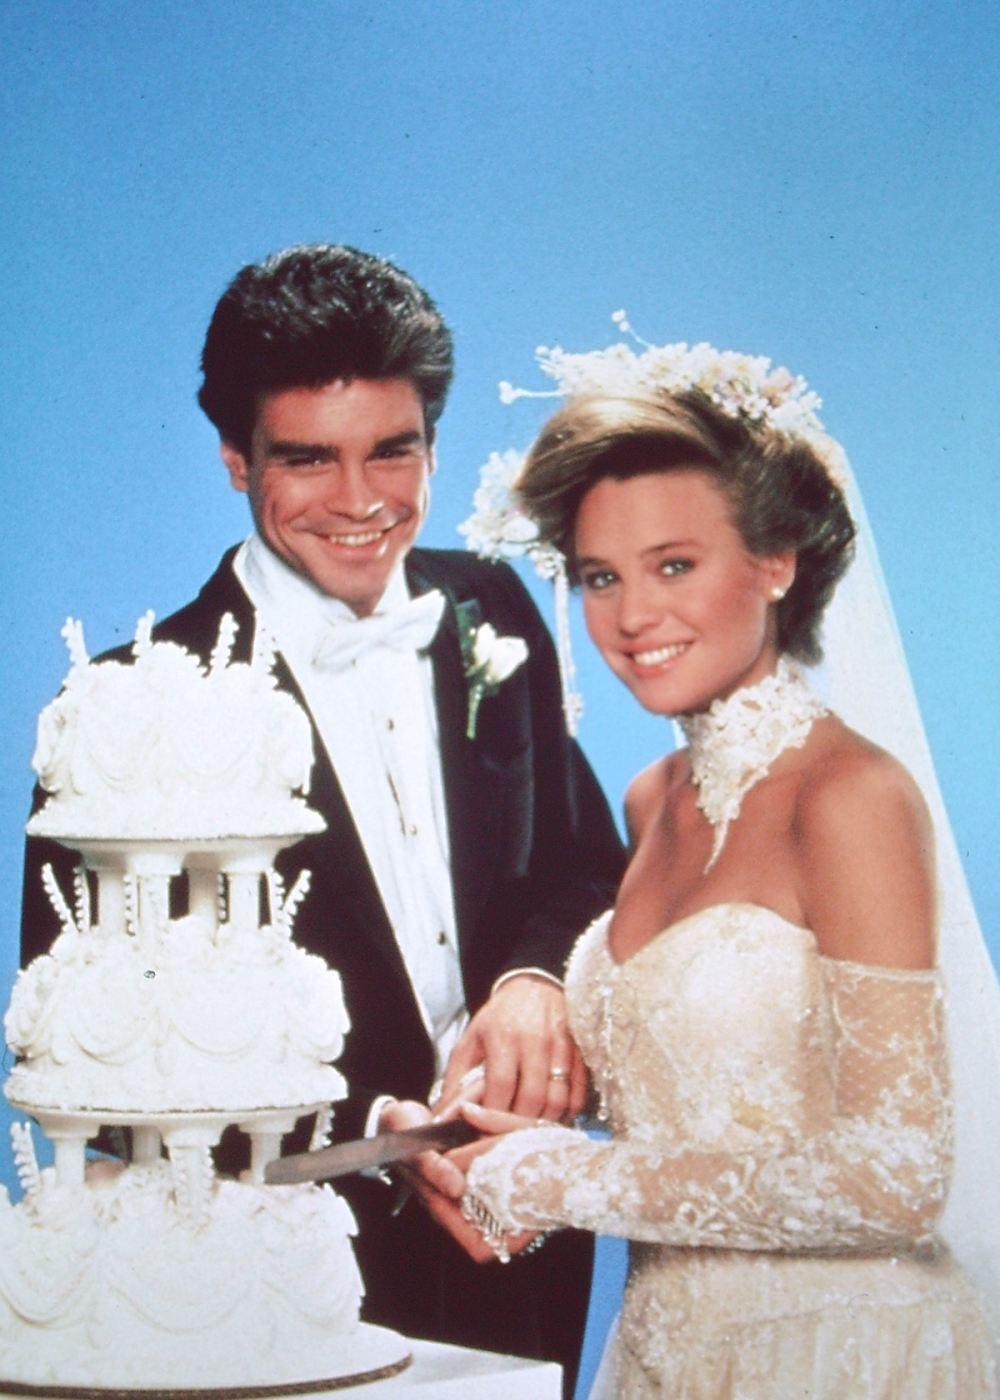 Kelly and joey wedding